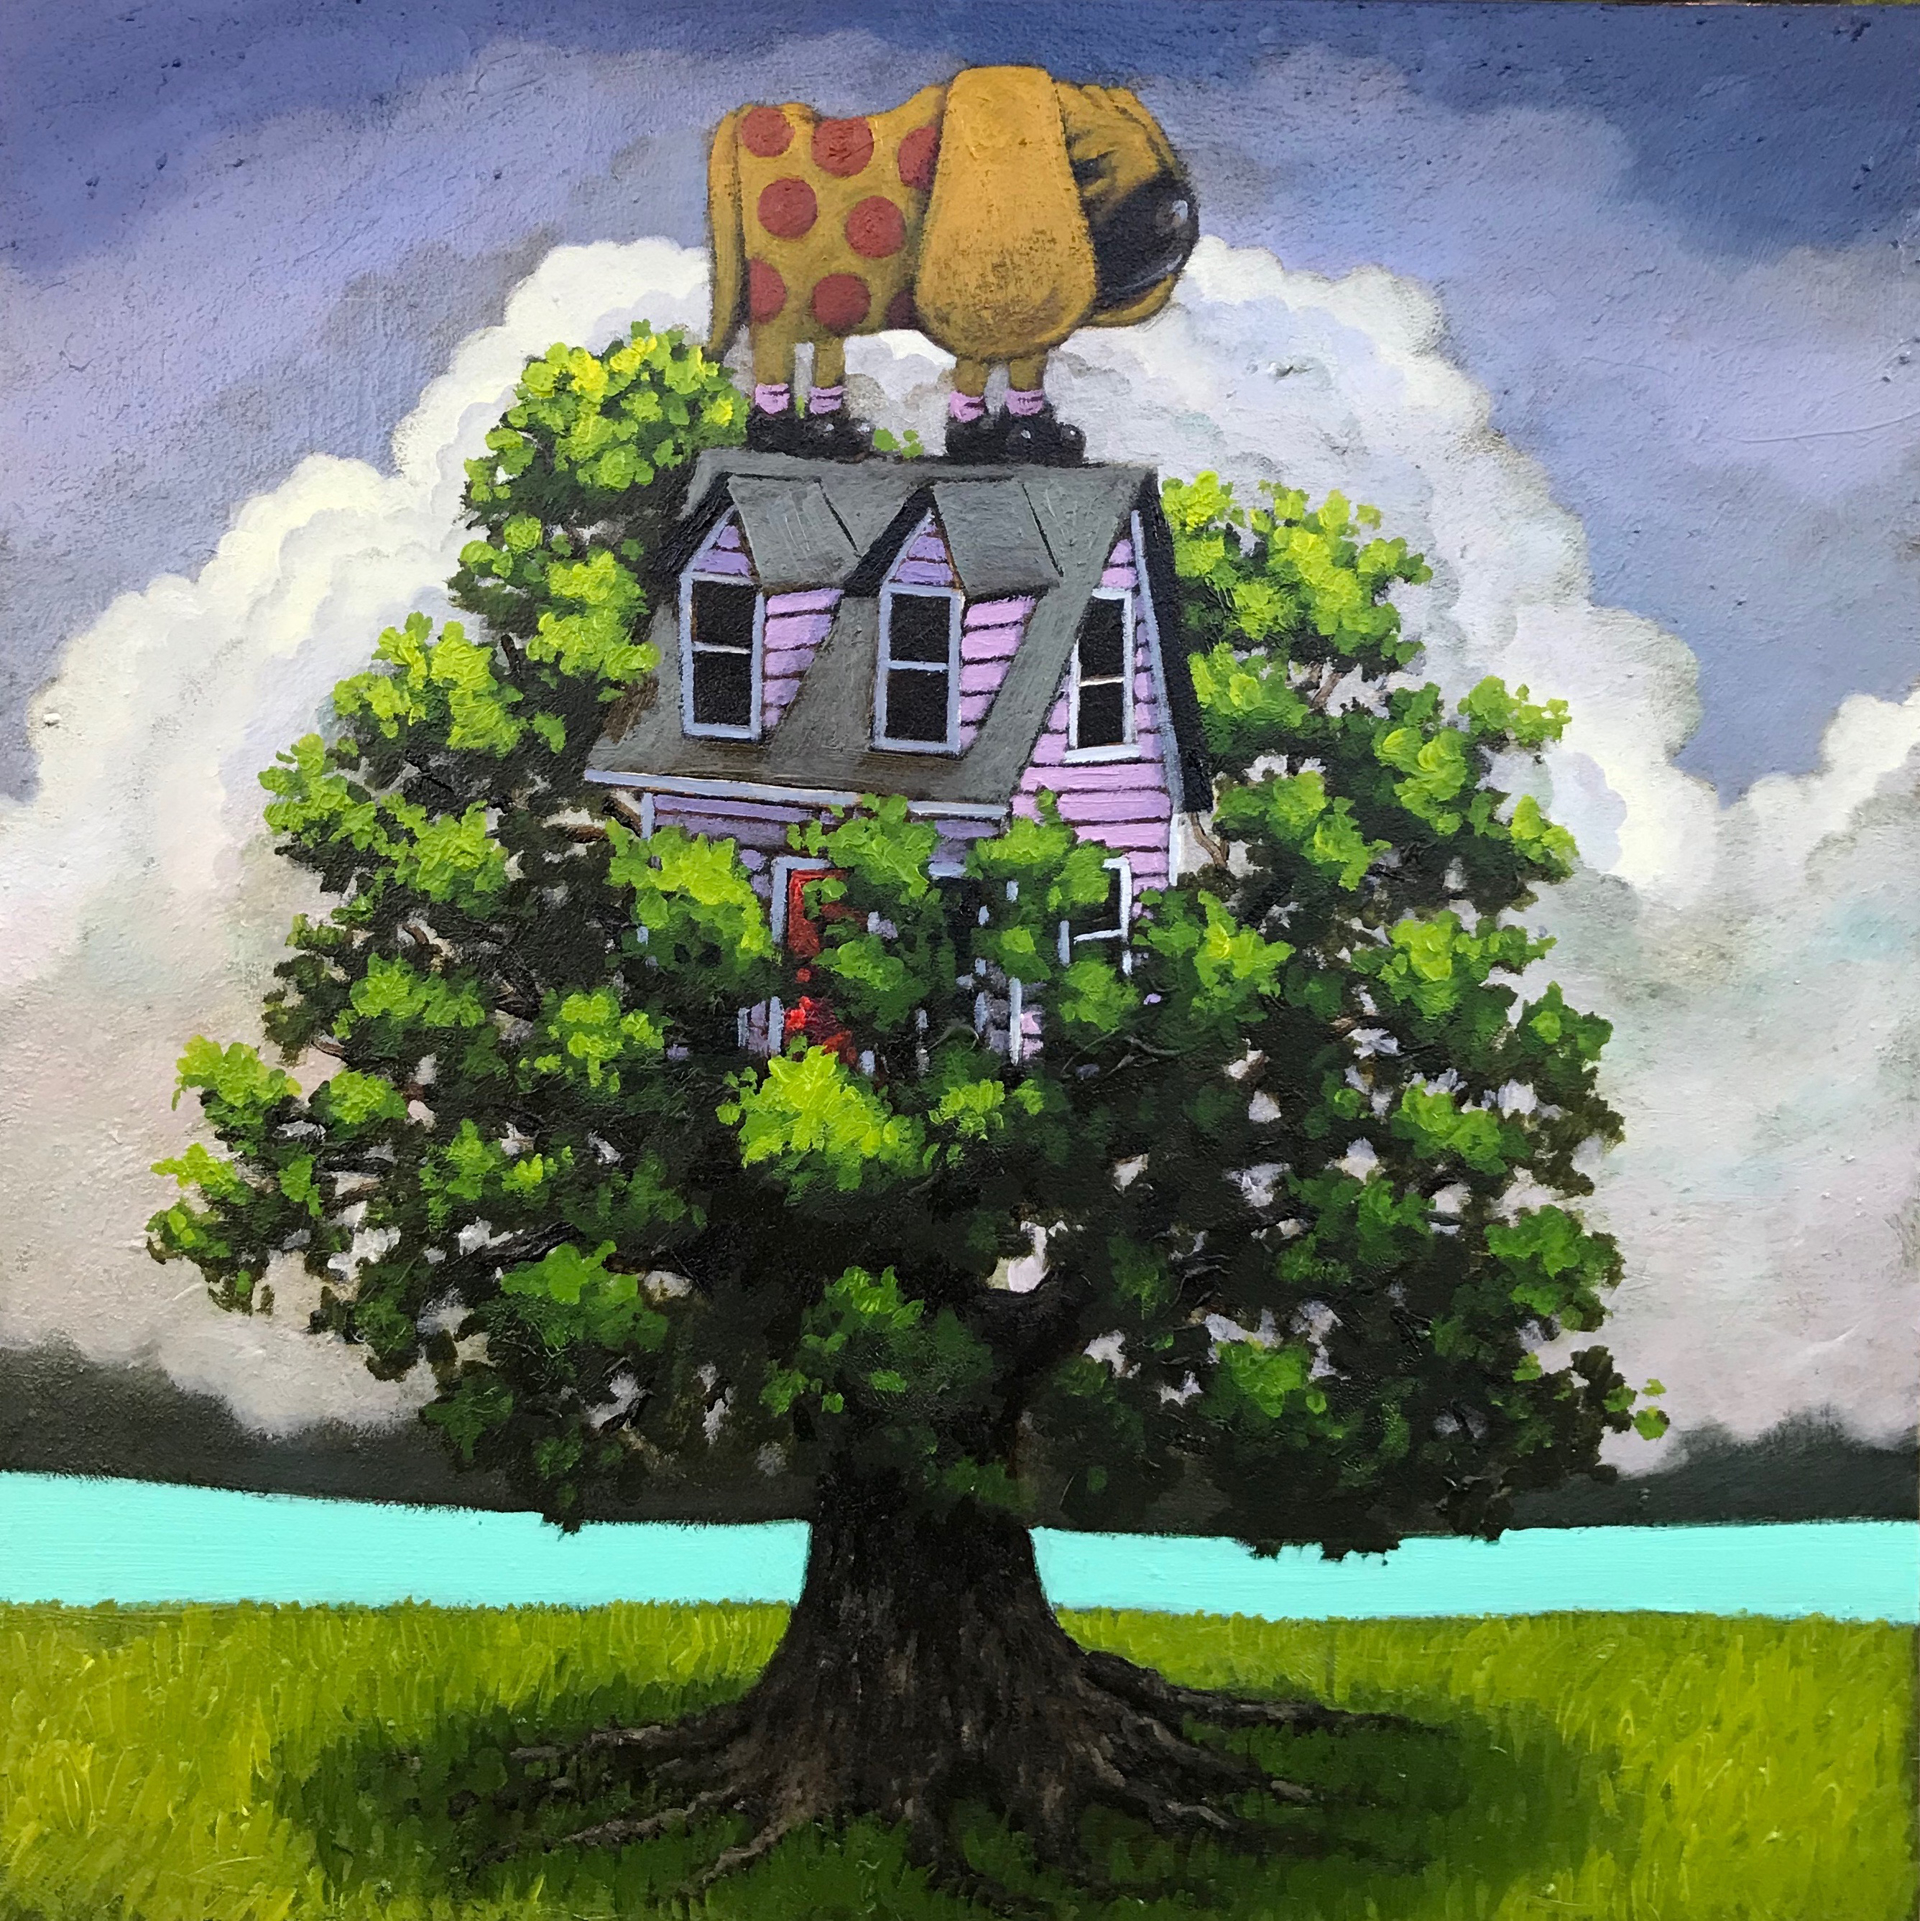 Doug House by Matt Lively